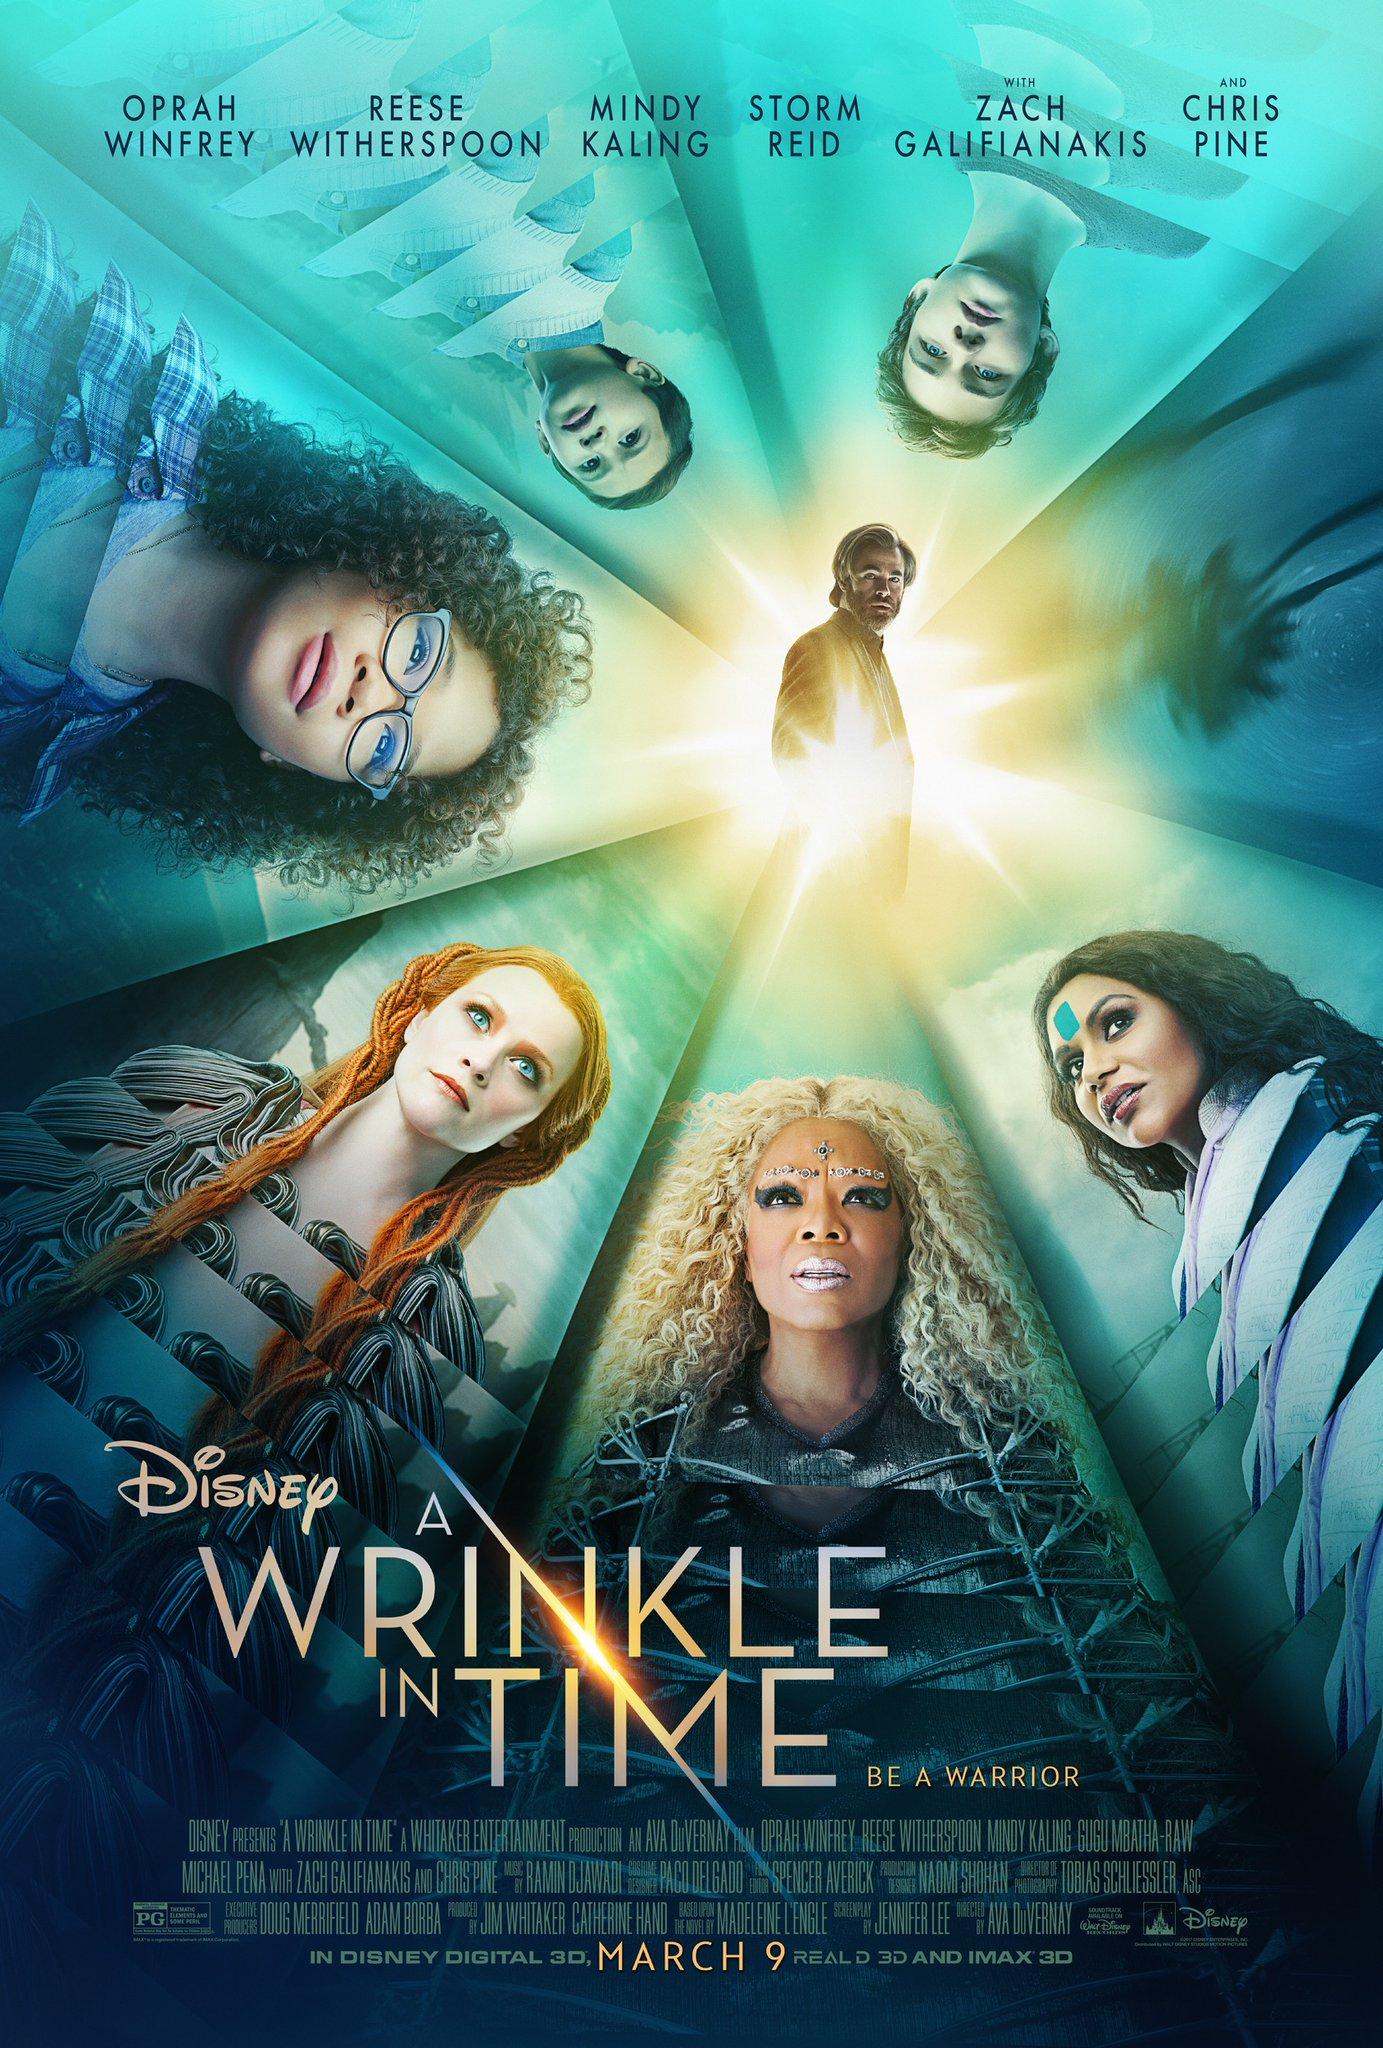 Road Warrior Trailer >> A Wrinkle in Time | Teaser Trailer